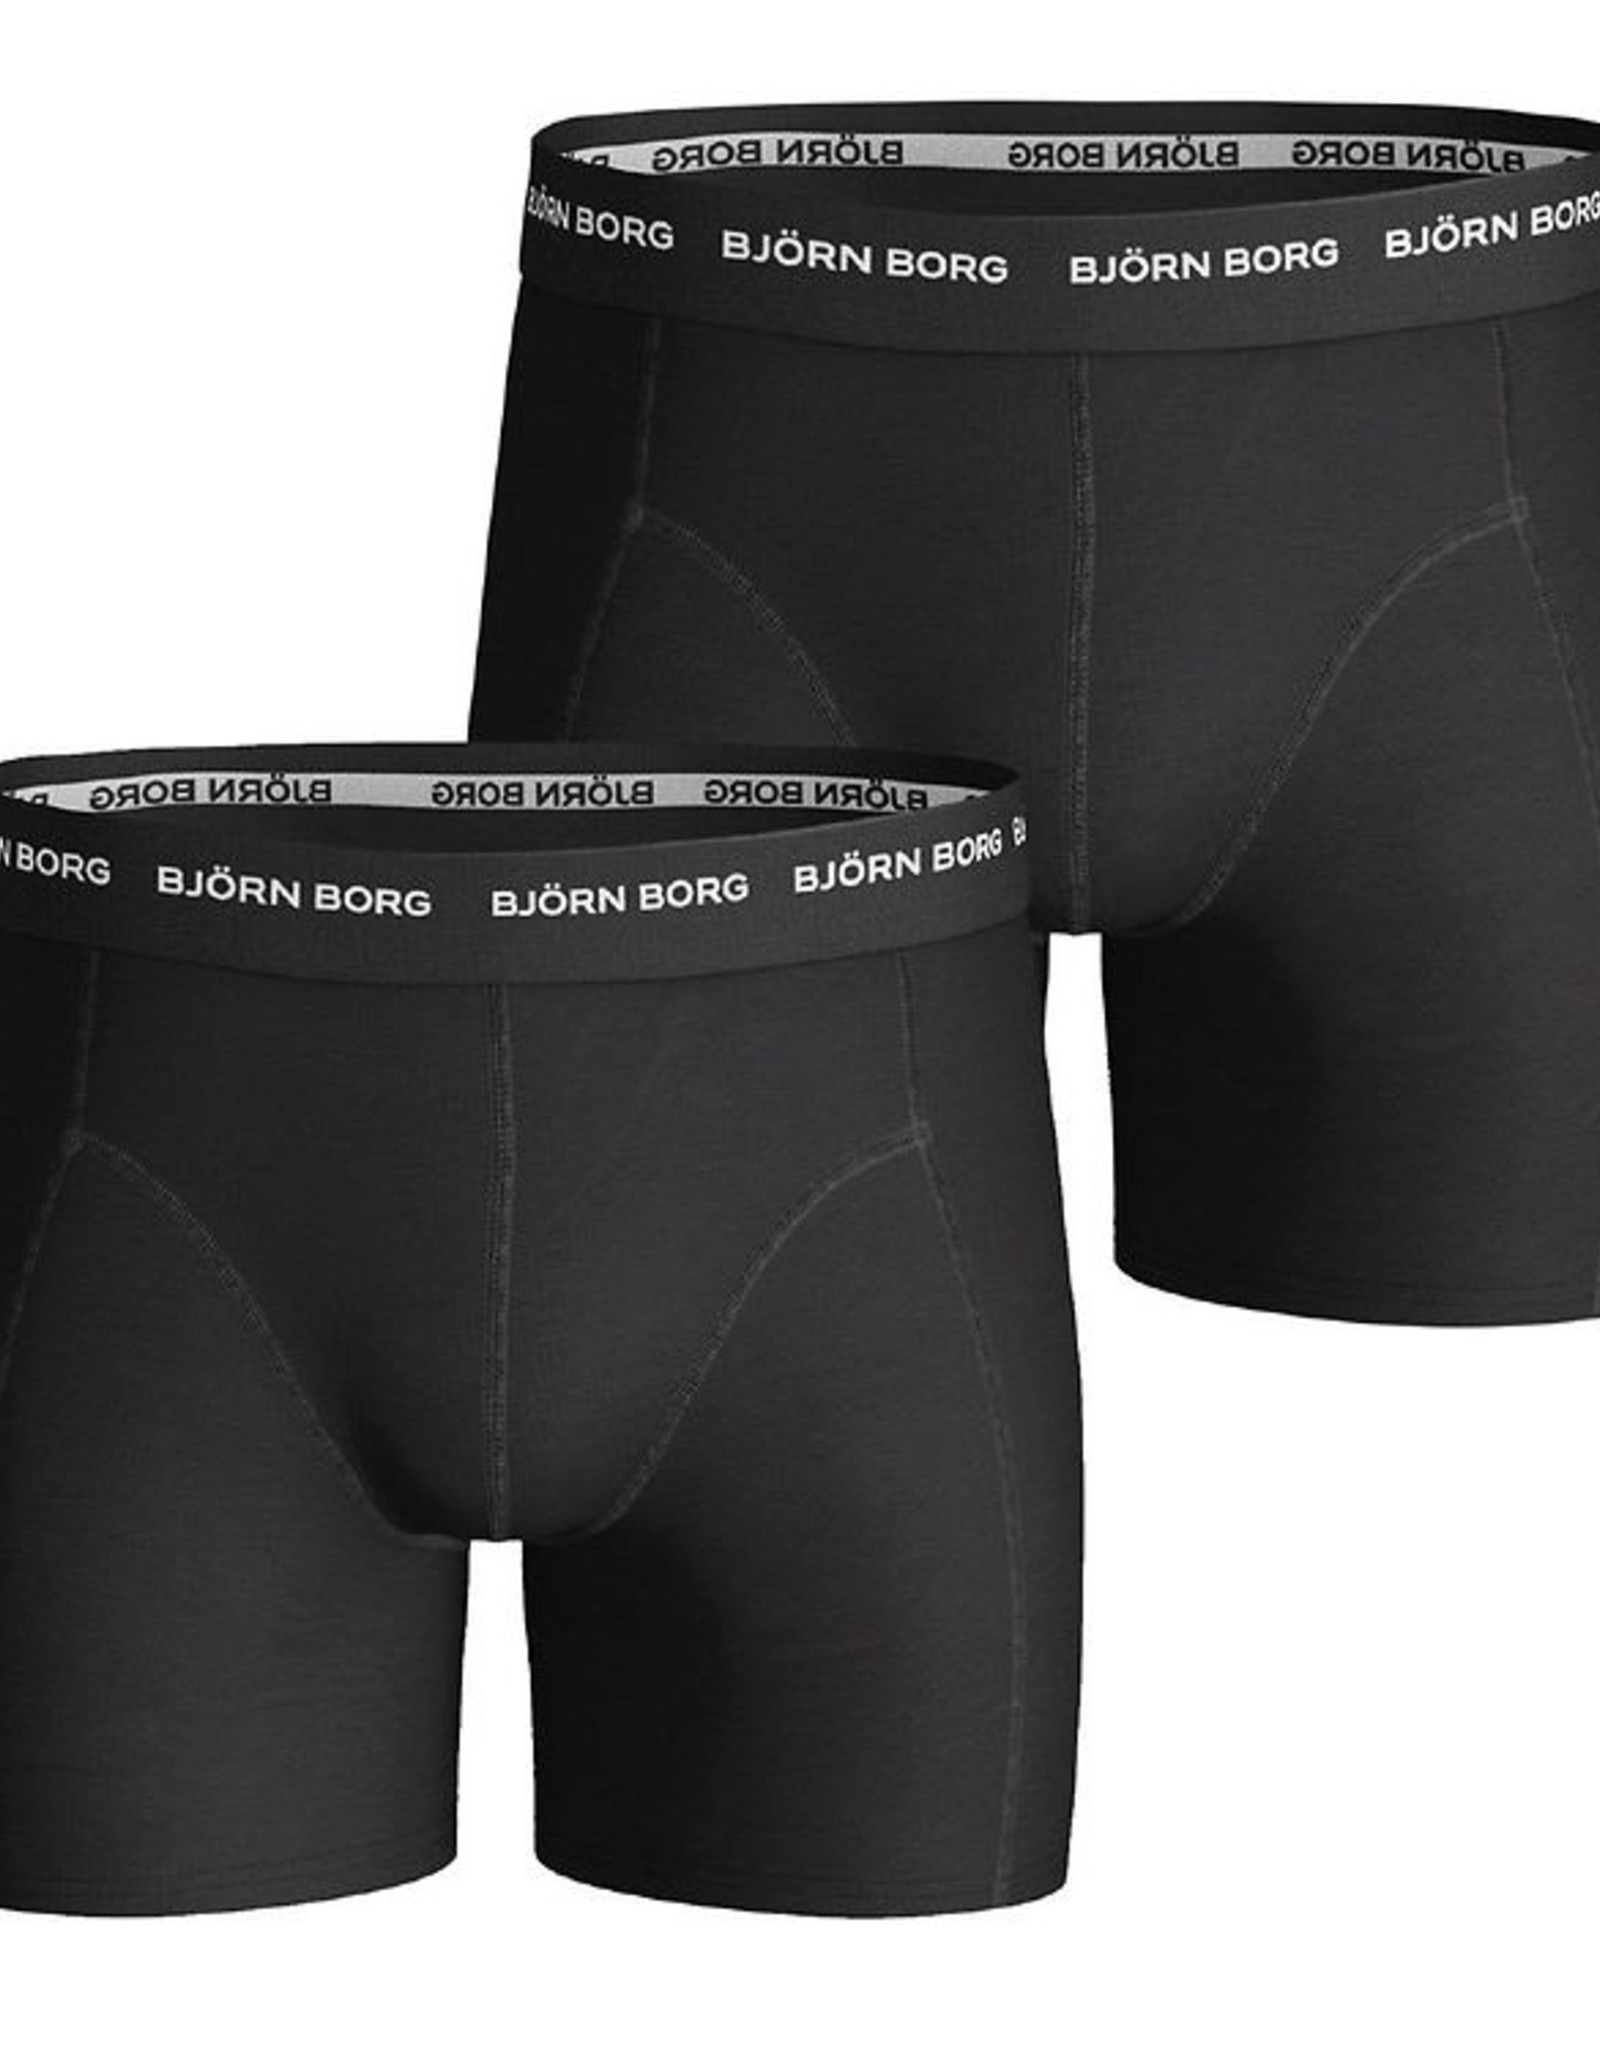 Bjorn Borg Boxershorts 2 Pack Running Solids